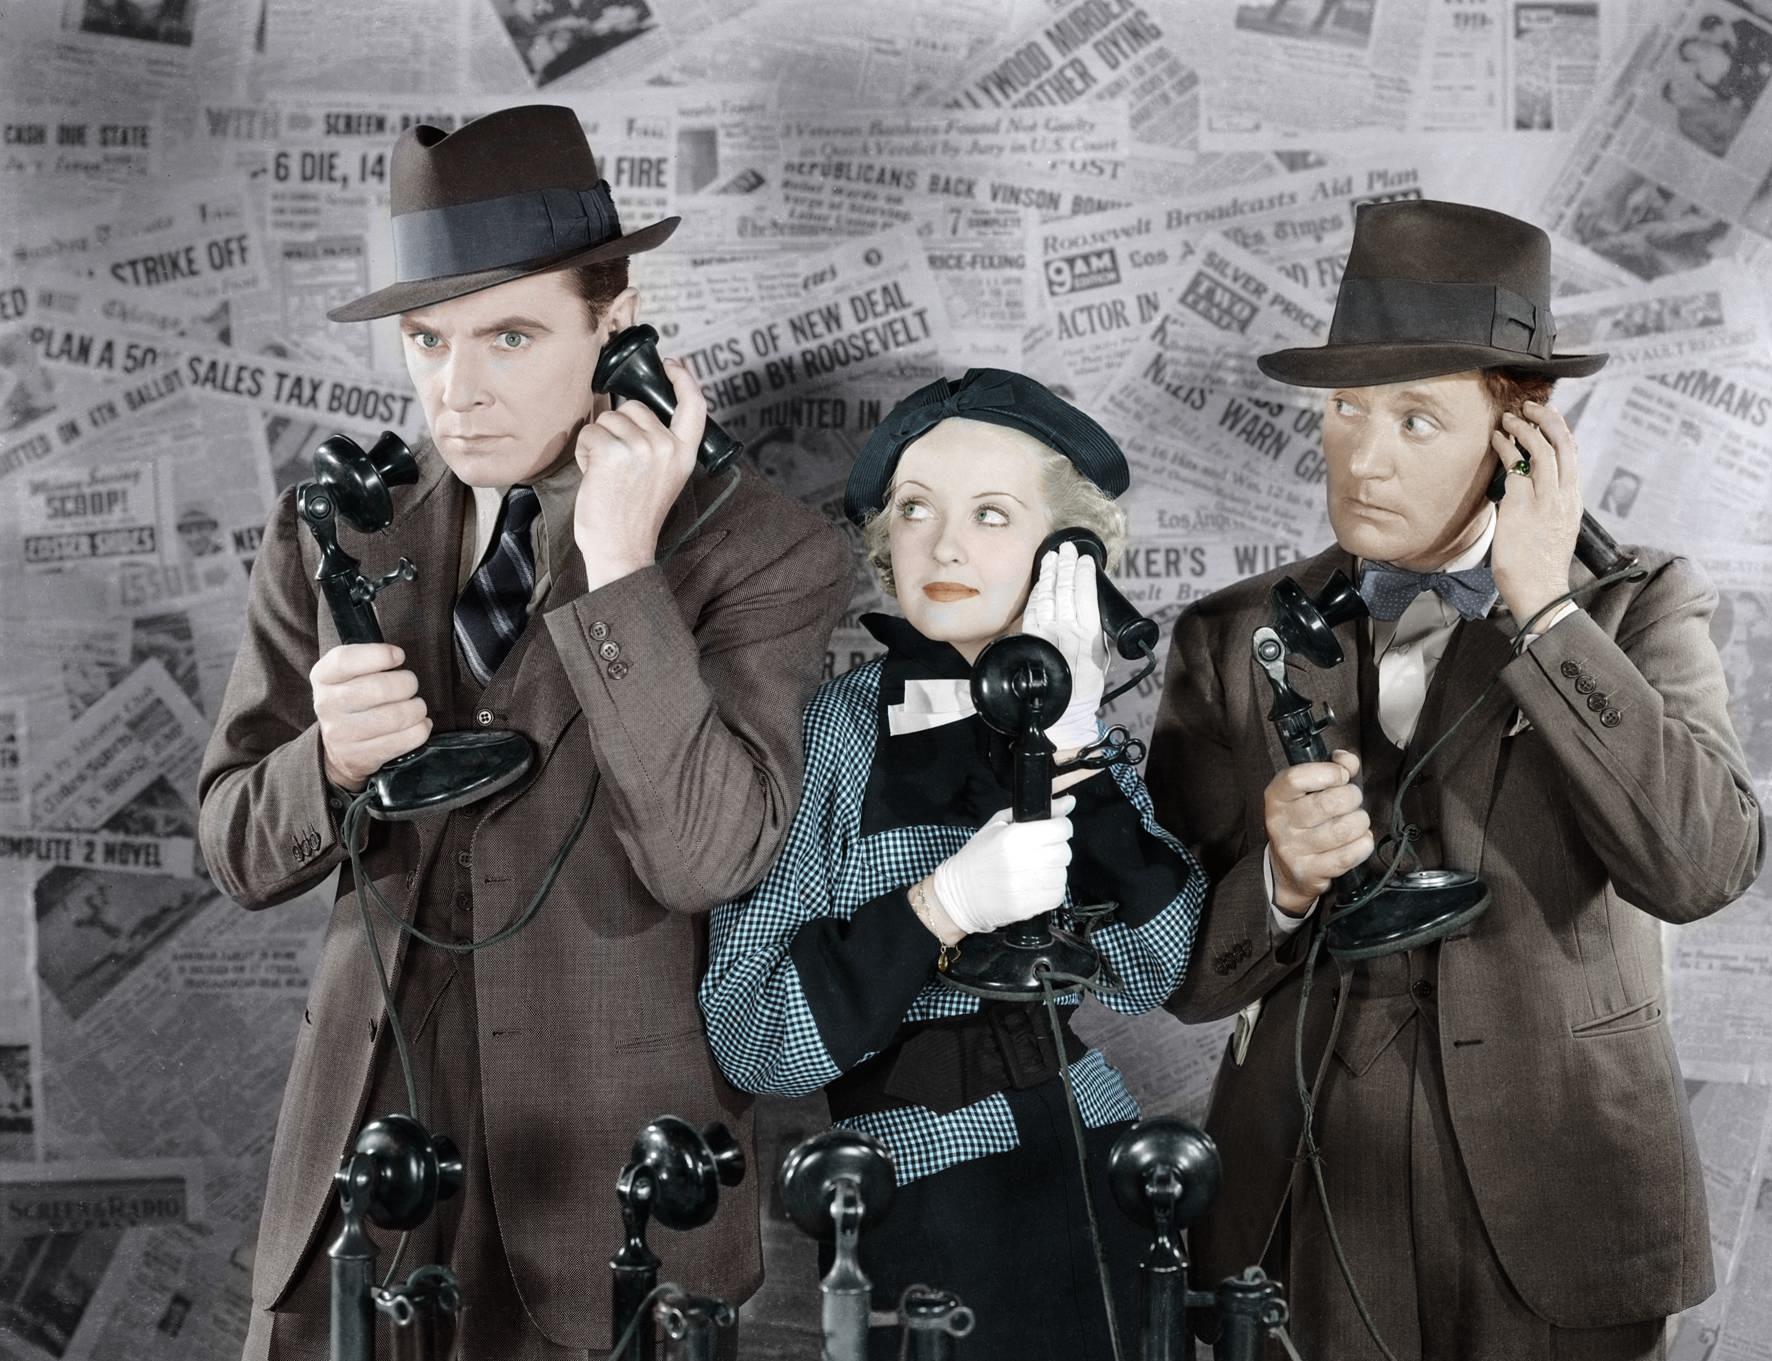 George Brent, Bette Davis, Roscoe Karns